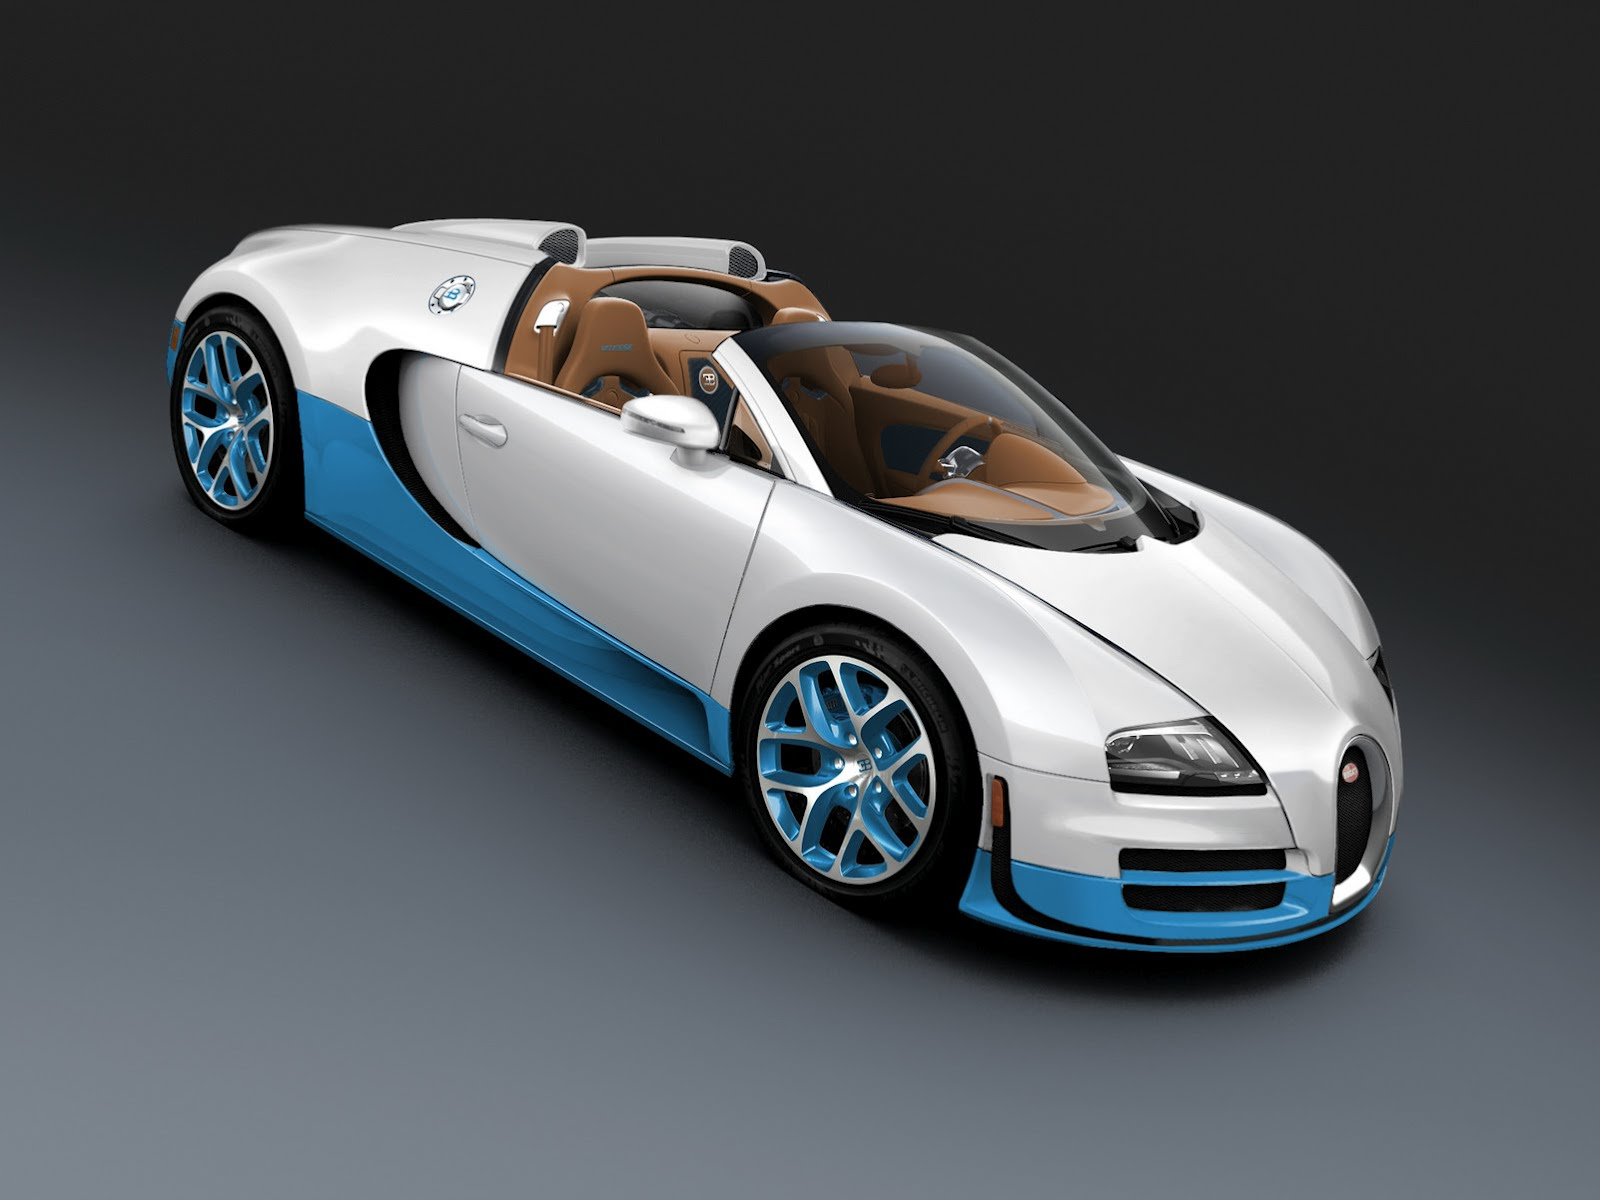 bugatti veyron grand sport vitesse special edition unveiled autoevolution. Black Bedroom Furniture Sets. Home Design Ideas